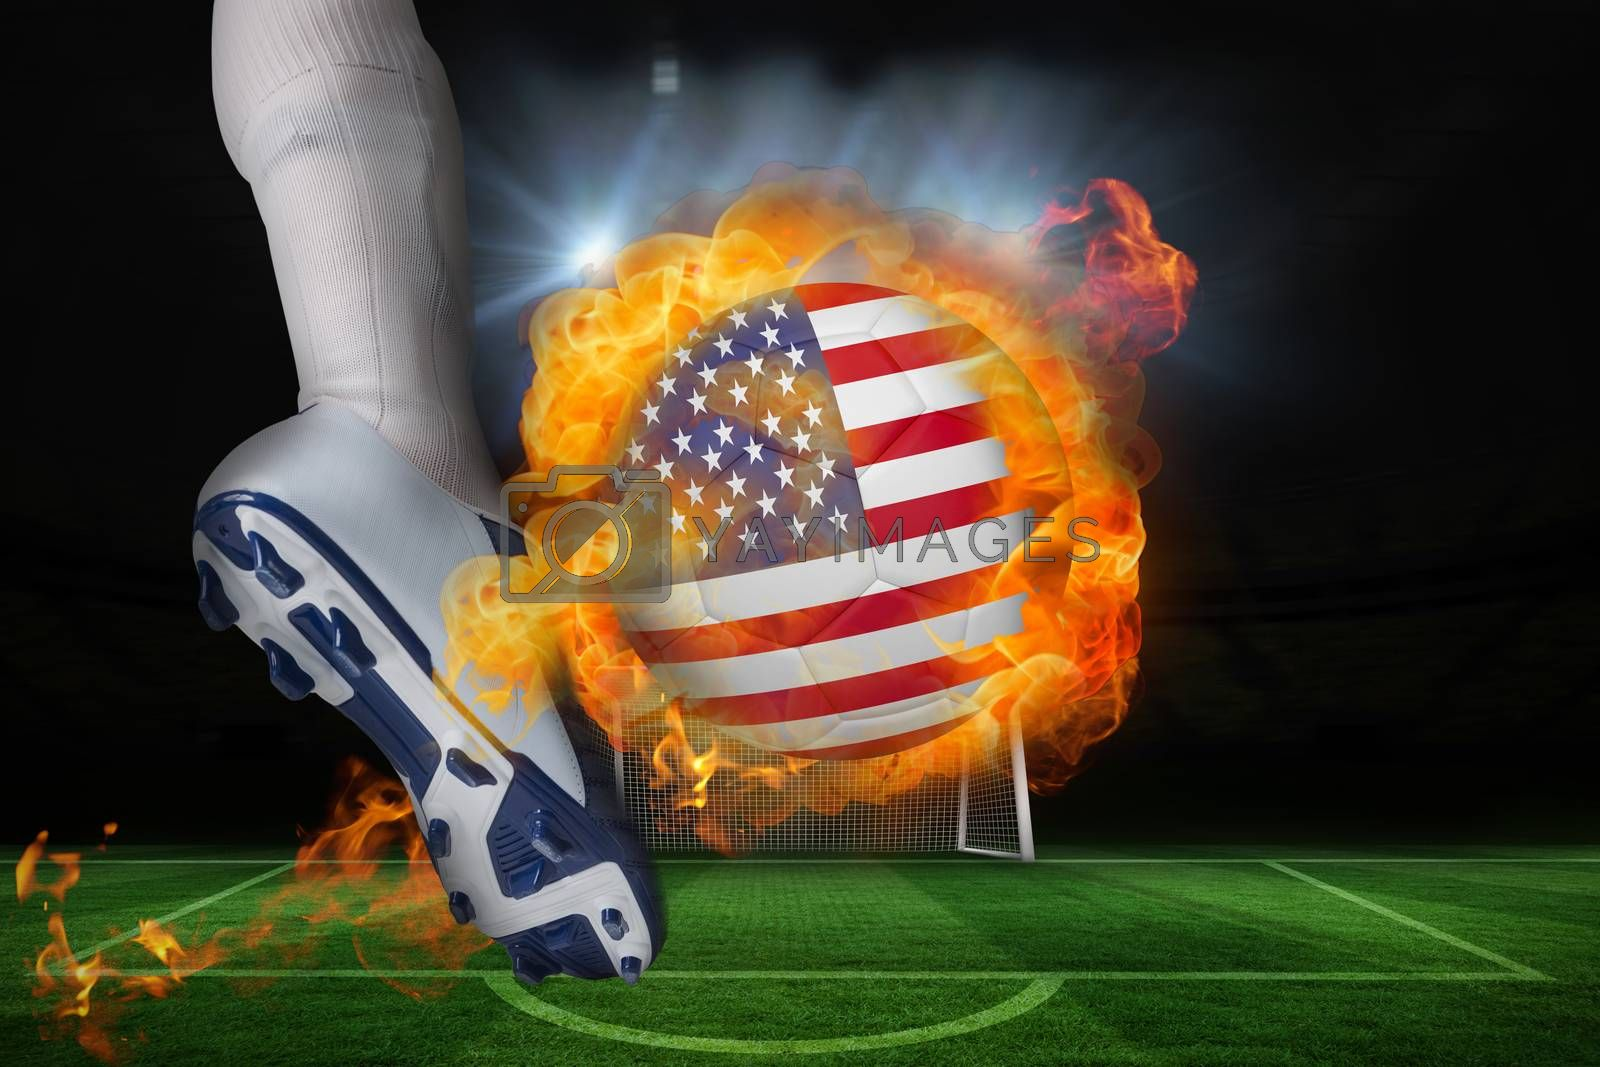 Football player kicking flaming usa flag ball by Wavebreakmedia